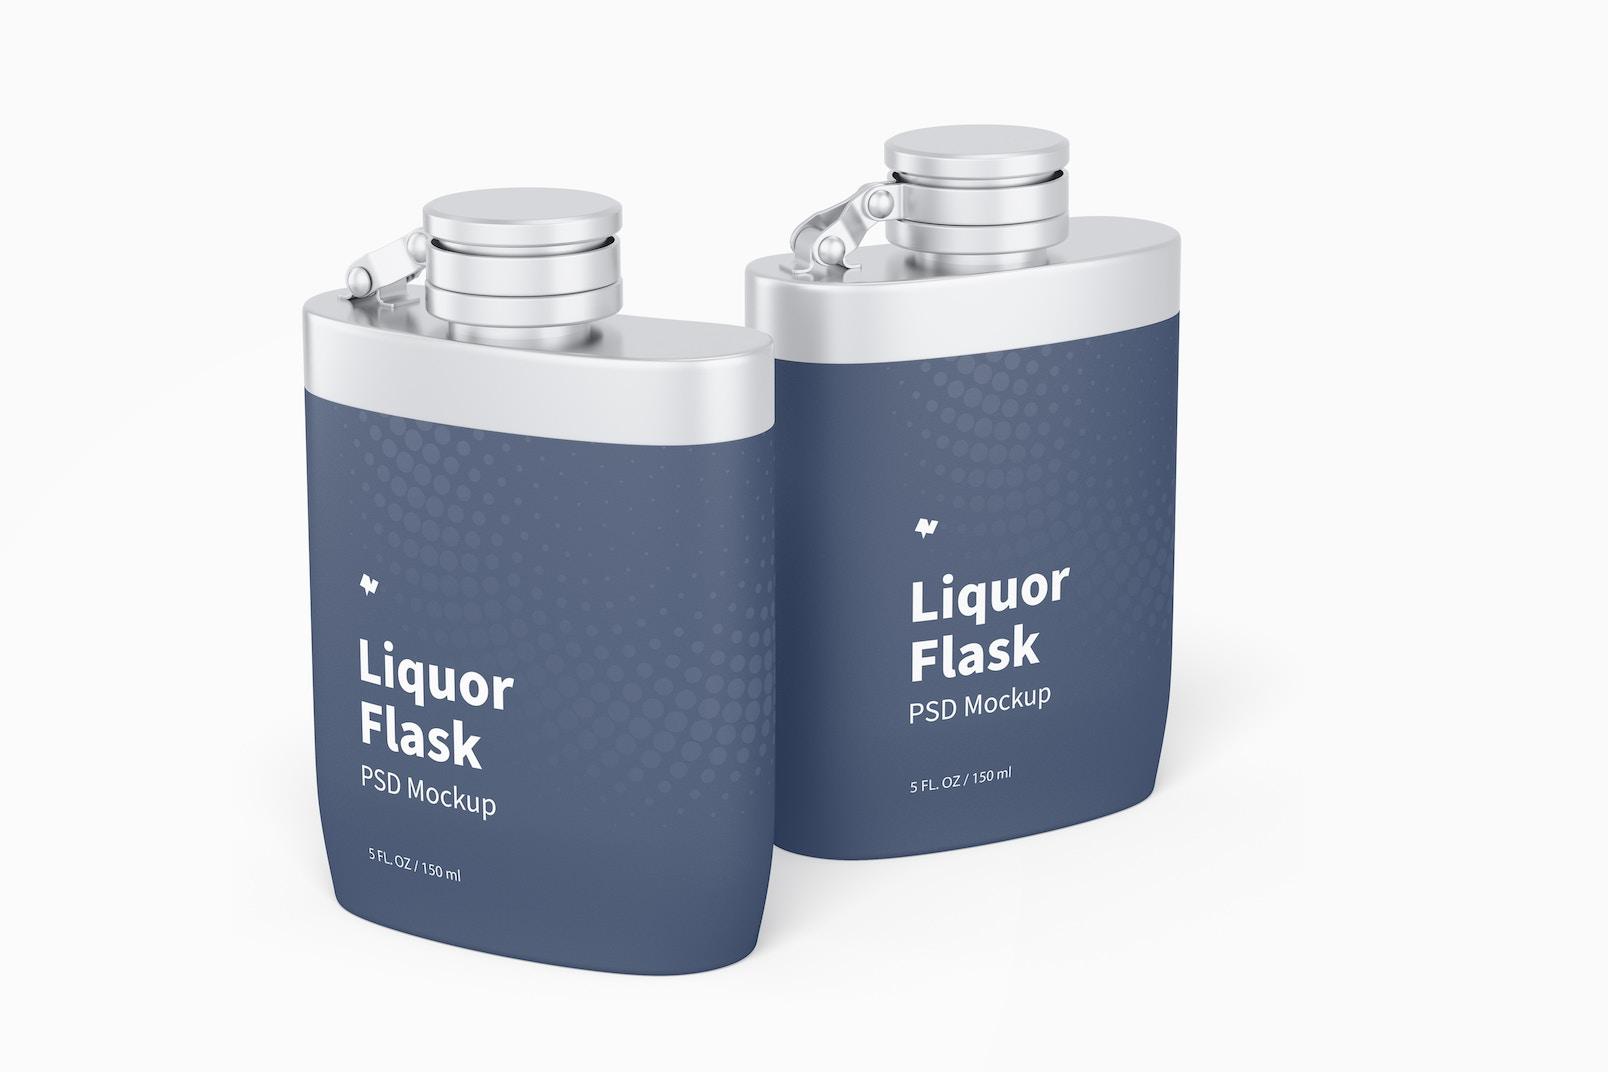 Liquor Flask With Plastic Wrap Mockup